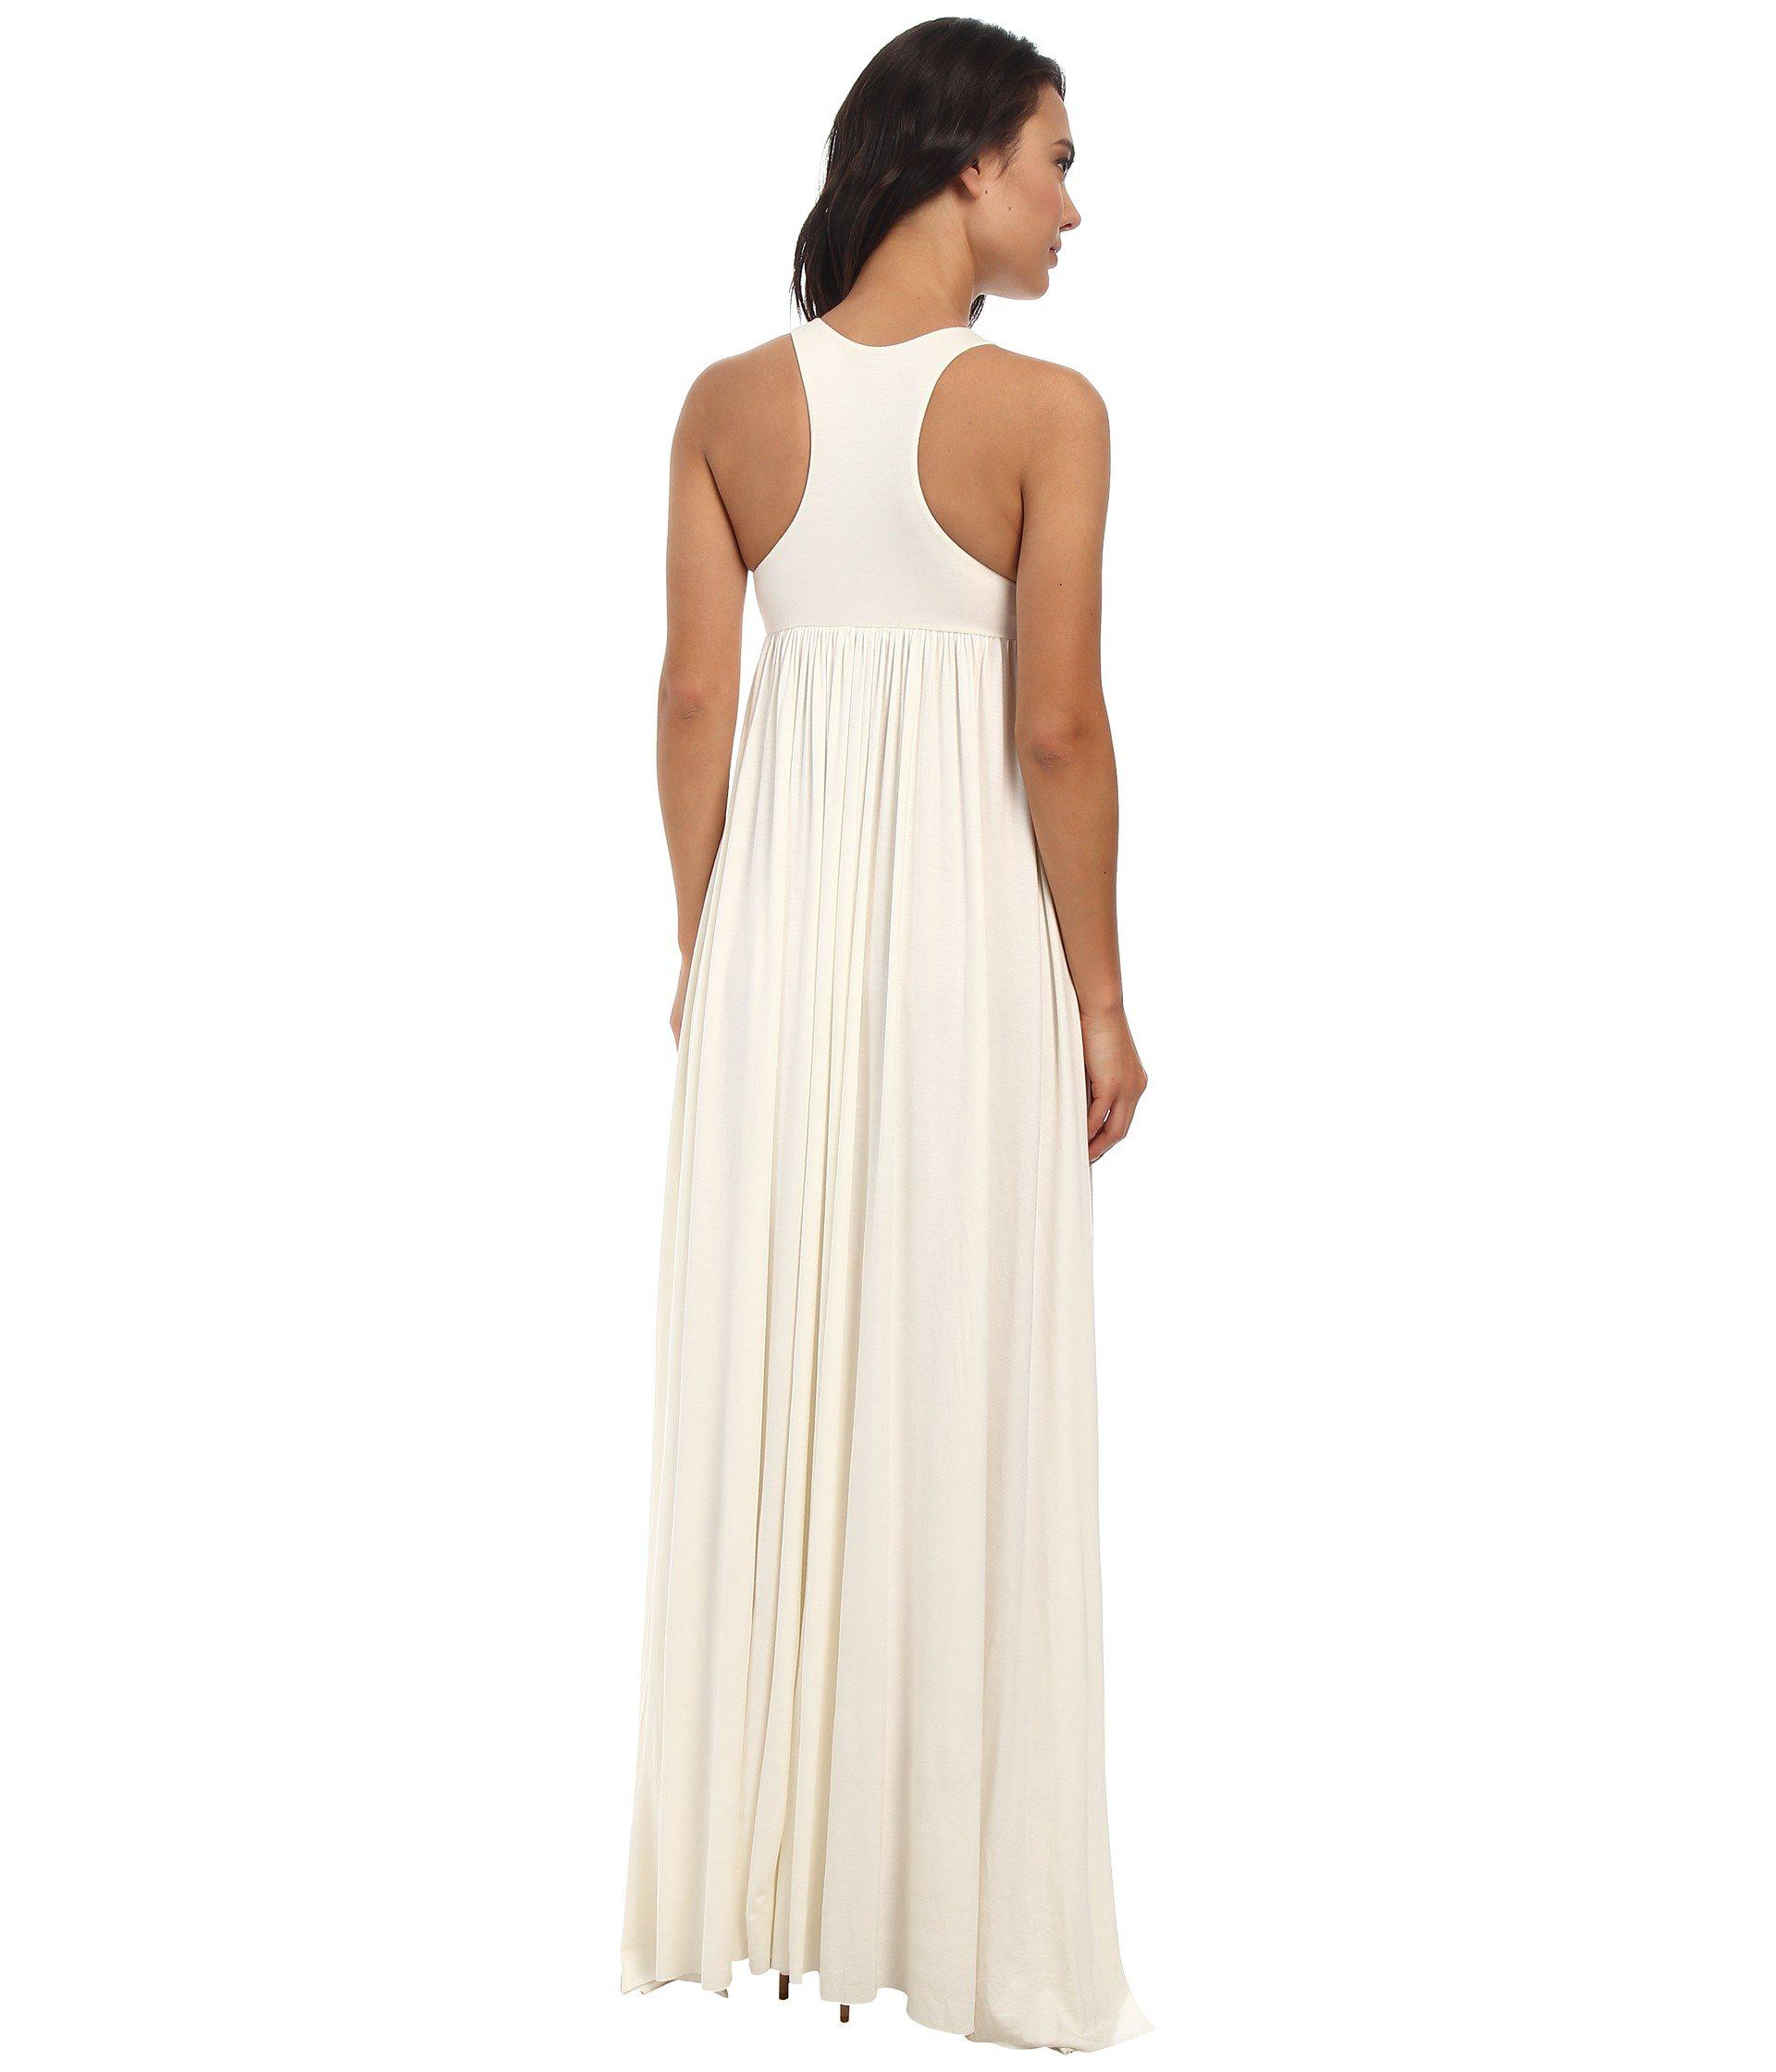 Lyst rachel pally anya dress in white rachel pally white anya dress lyst view fullscreen ombrellifo Image collections